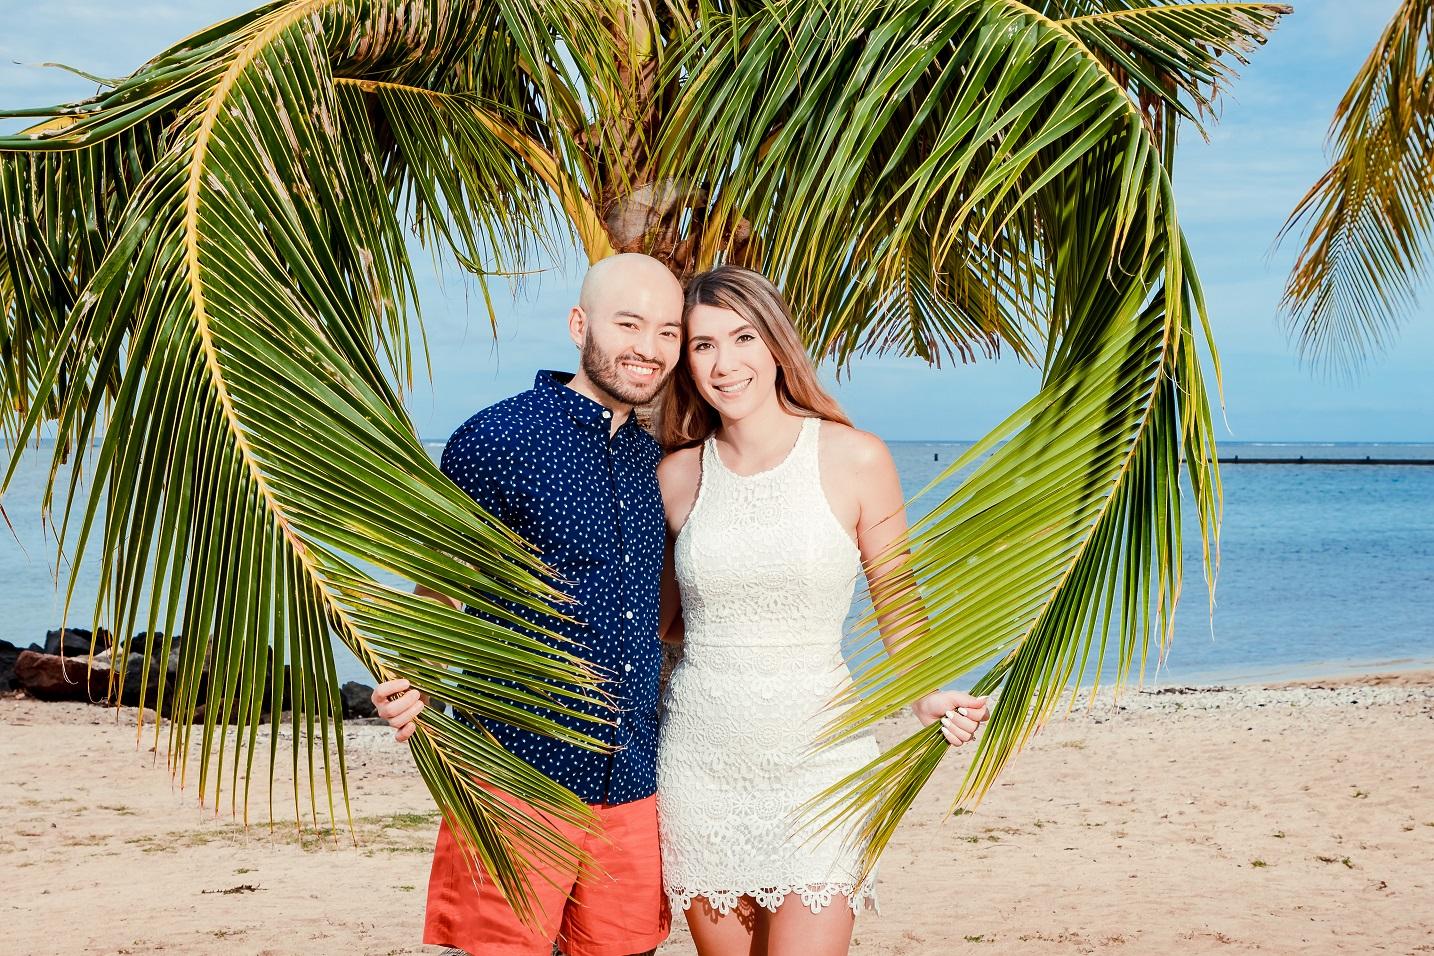 oahu beach couples photographer poses honolulu